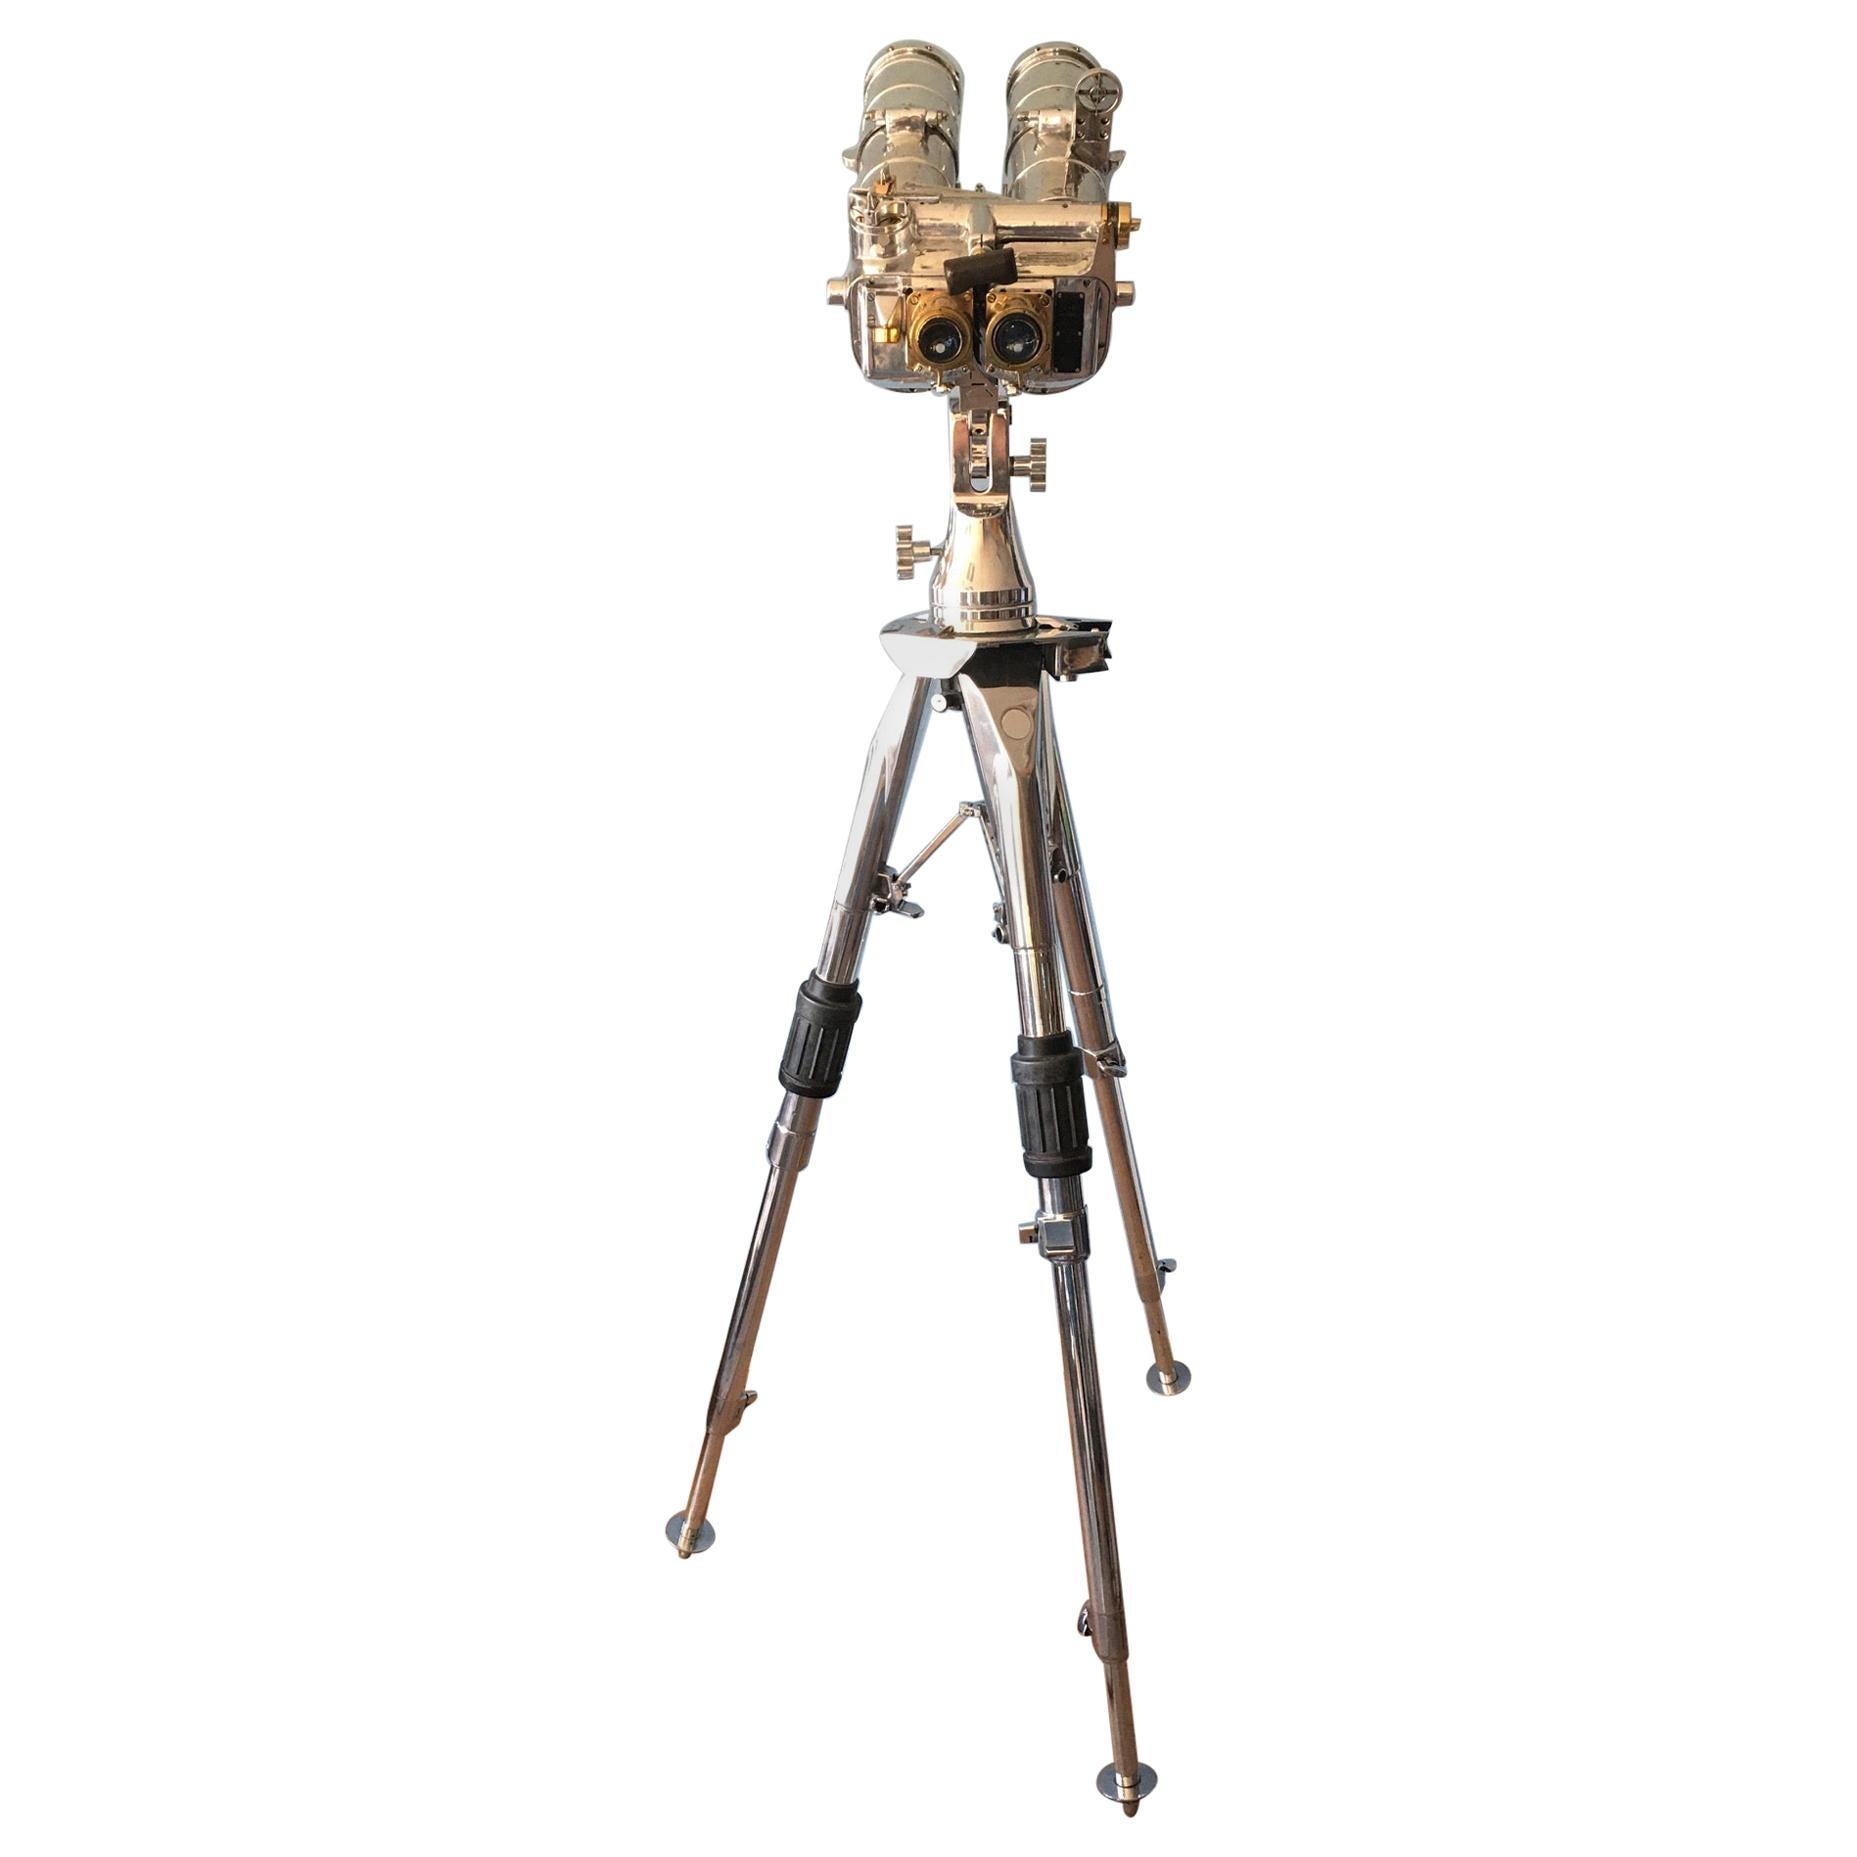 Carl Zeiss Marine Binoculars WWII